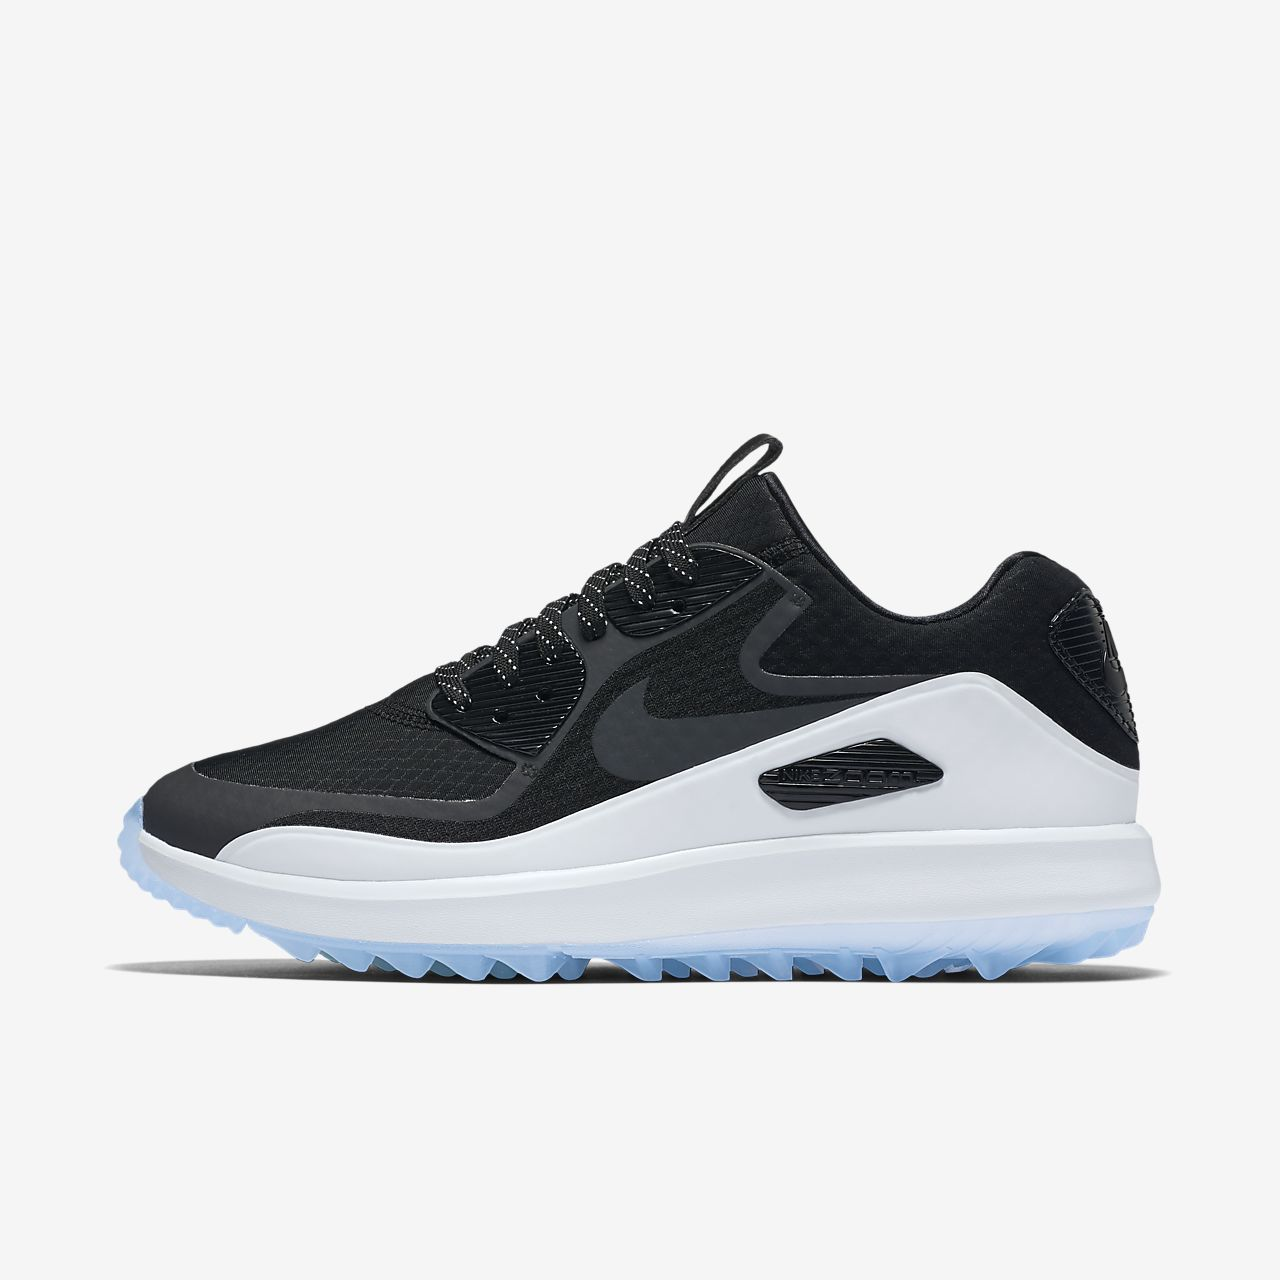 free shipping 9155a c8b27 Scarpa da golf Nike Air Zoom 90 IT - Donna